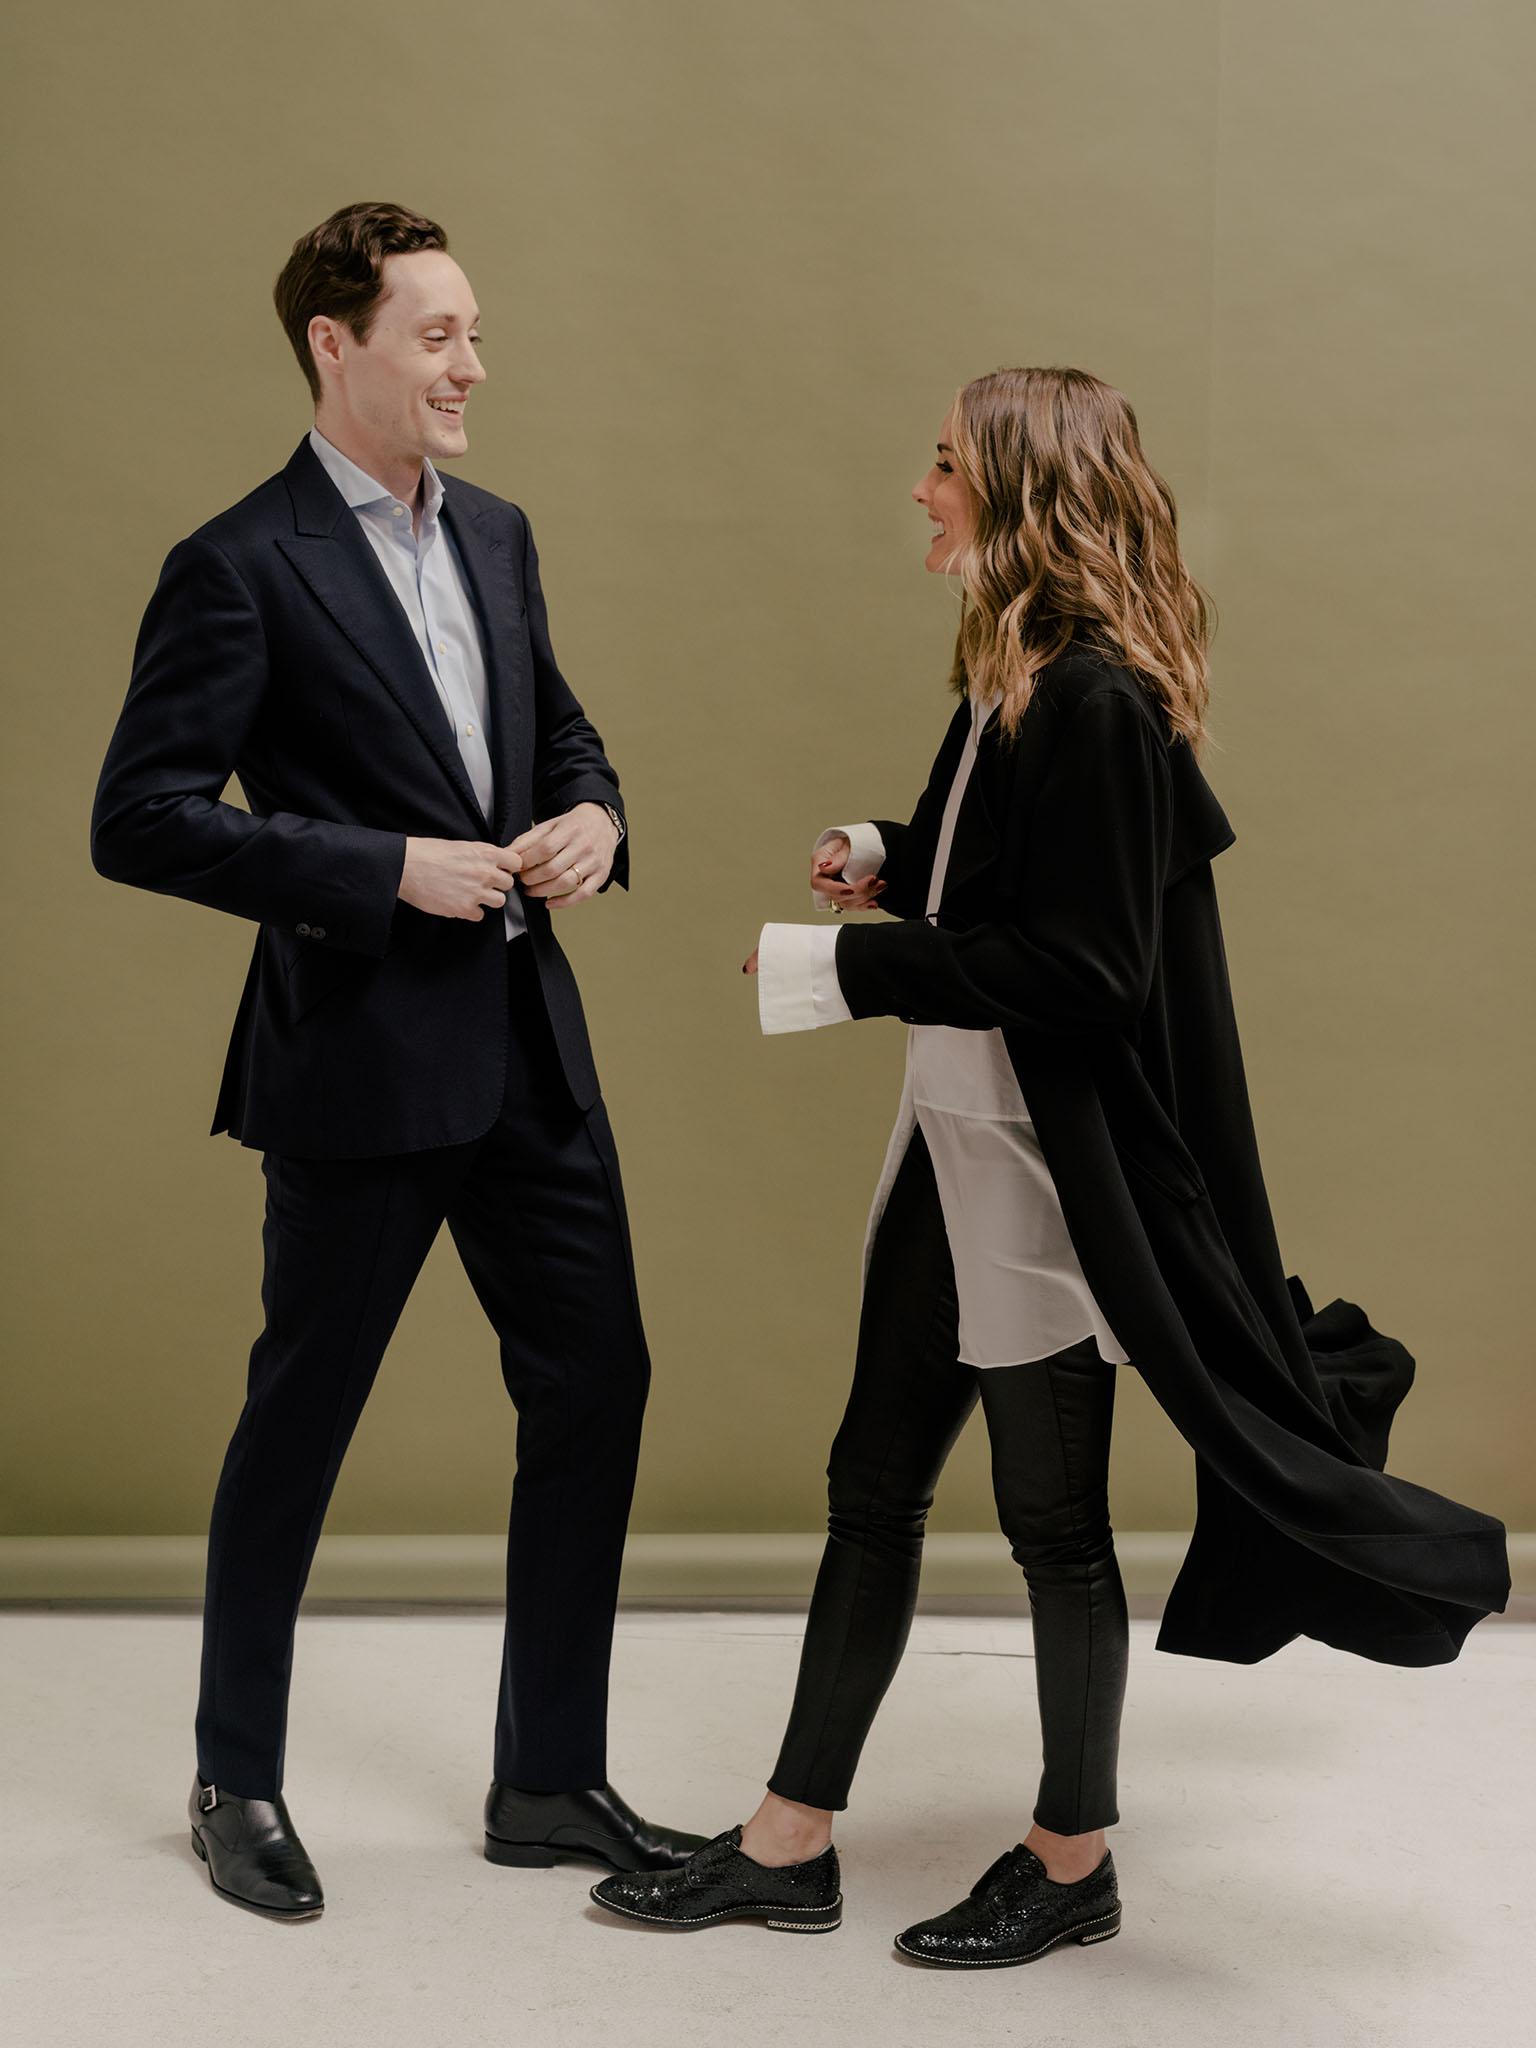 Olivia and Grant Palermo